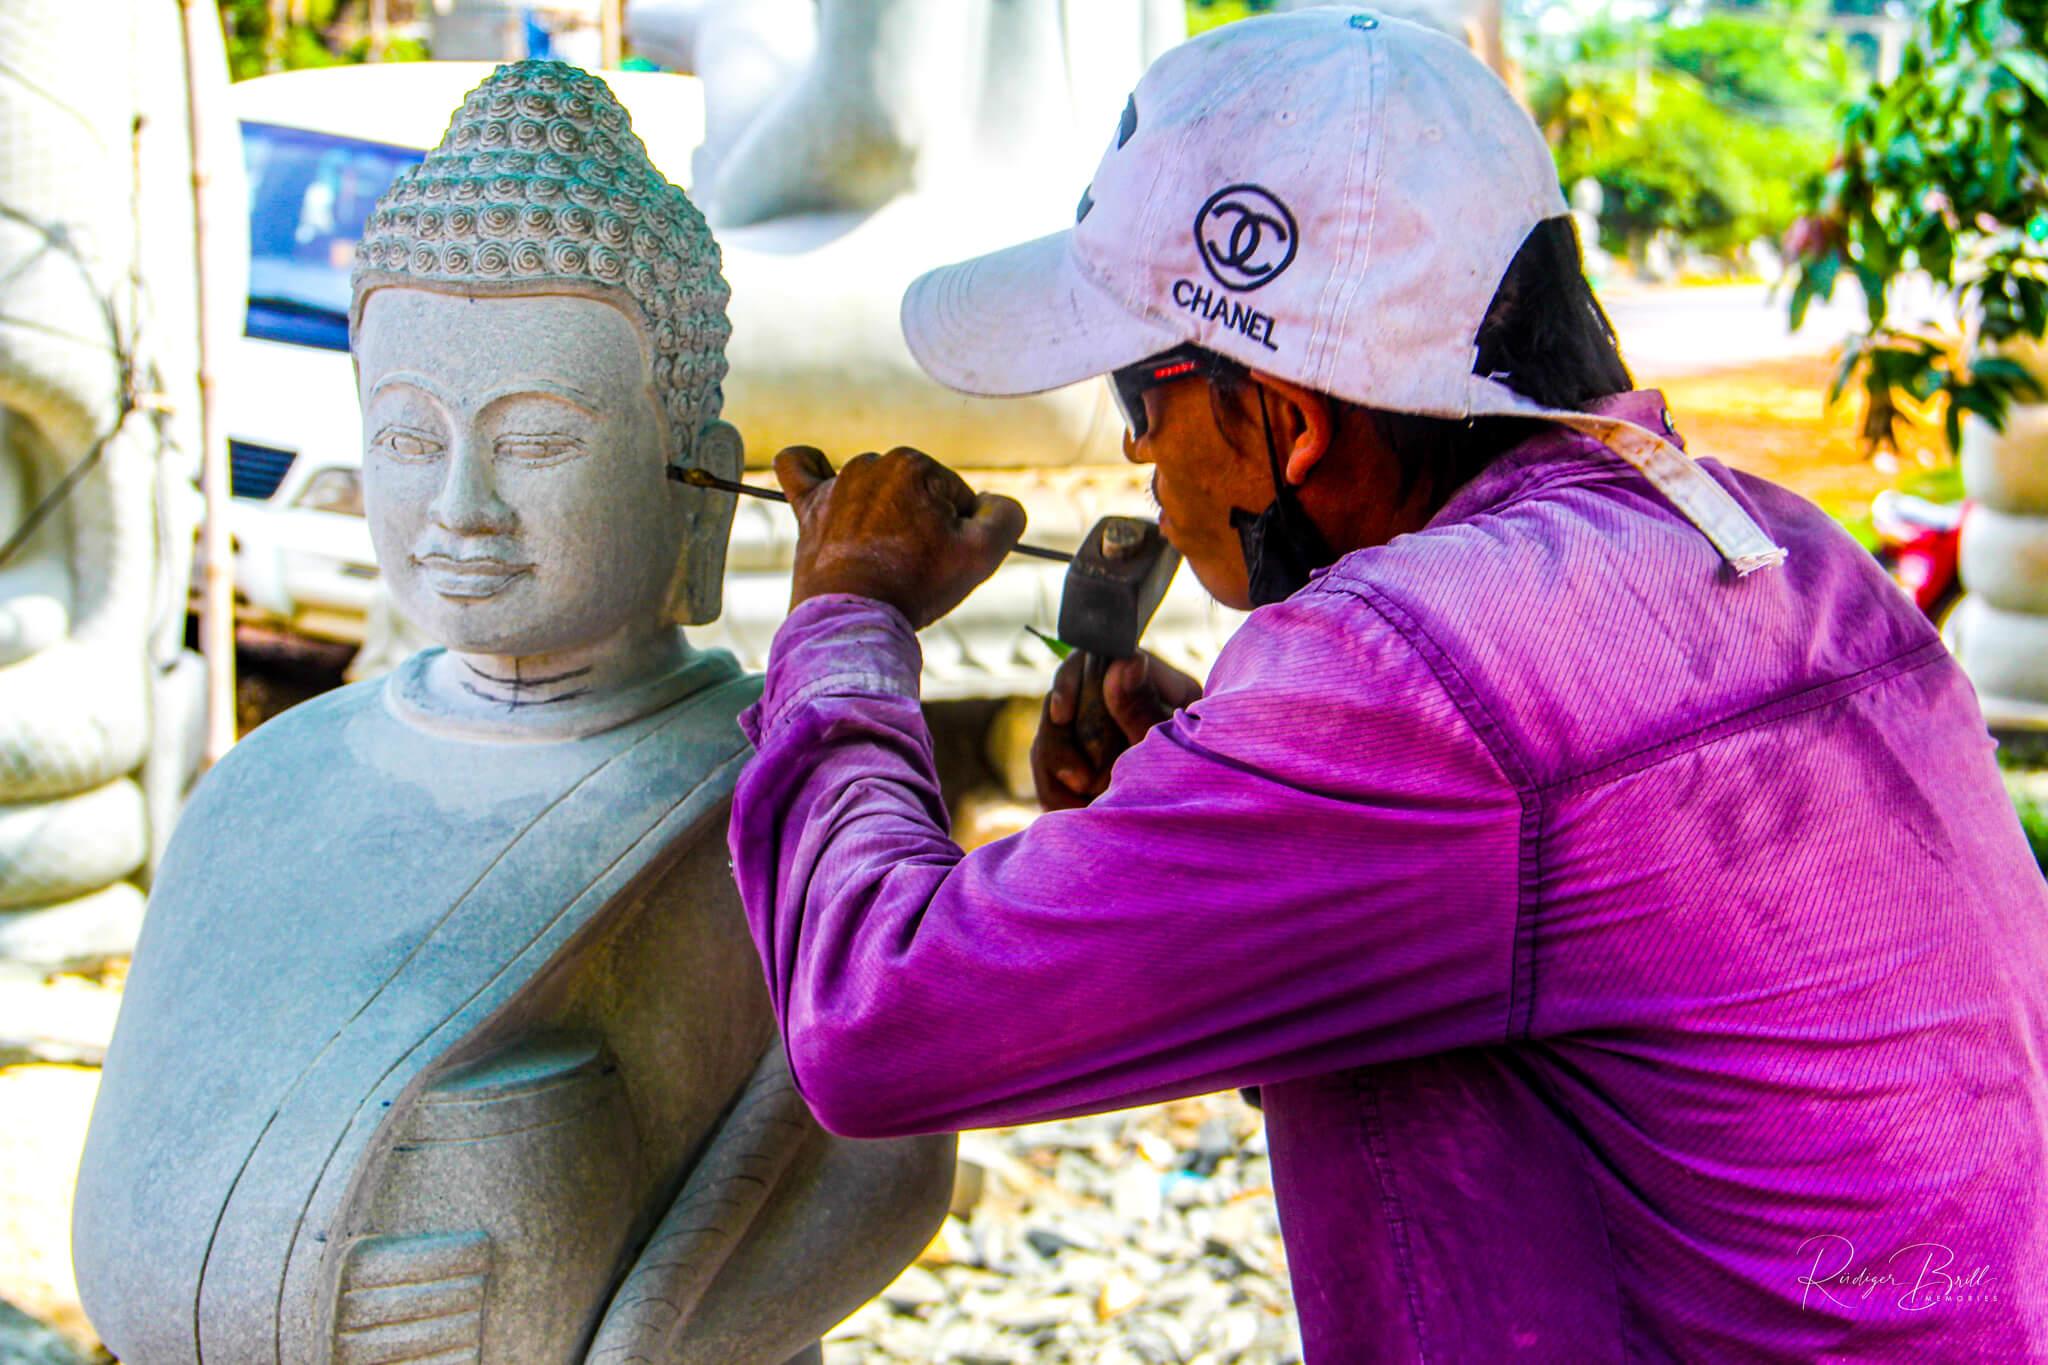 Bildhauer in Kambodscha